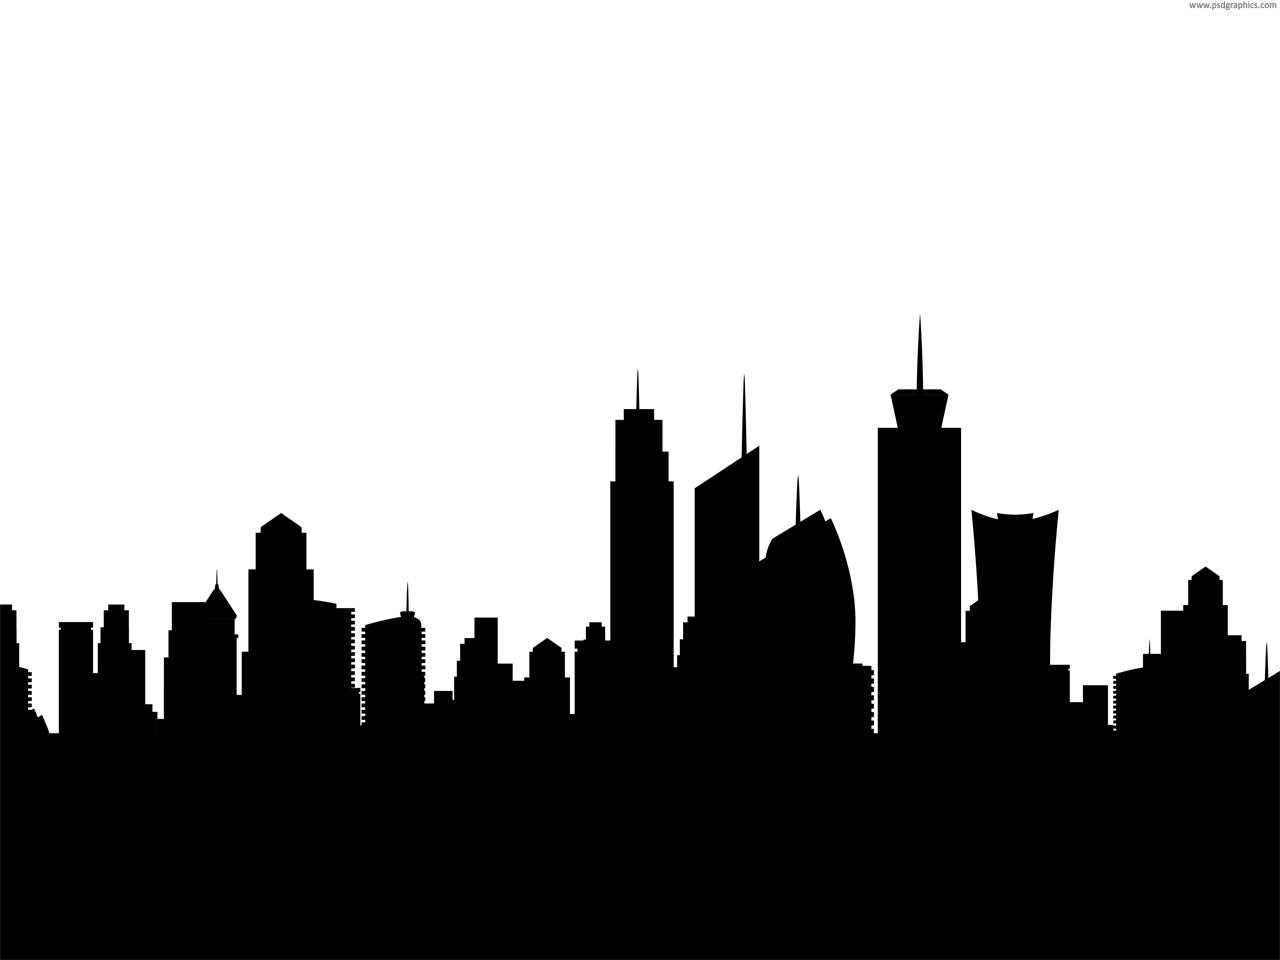 1280x960 City Skyline Silhouette Psdgraphics